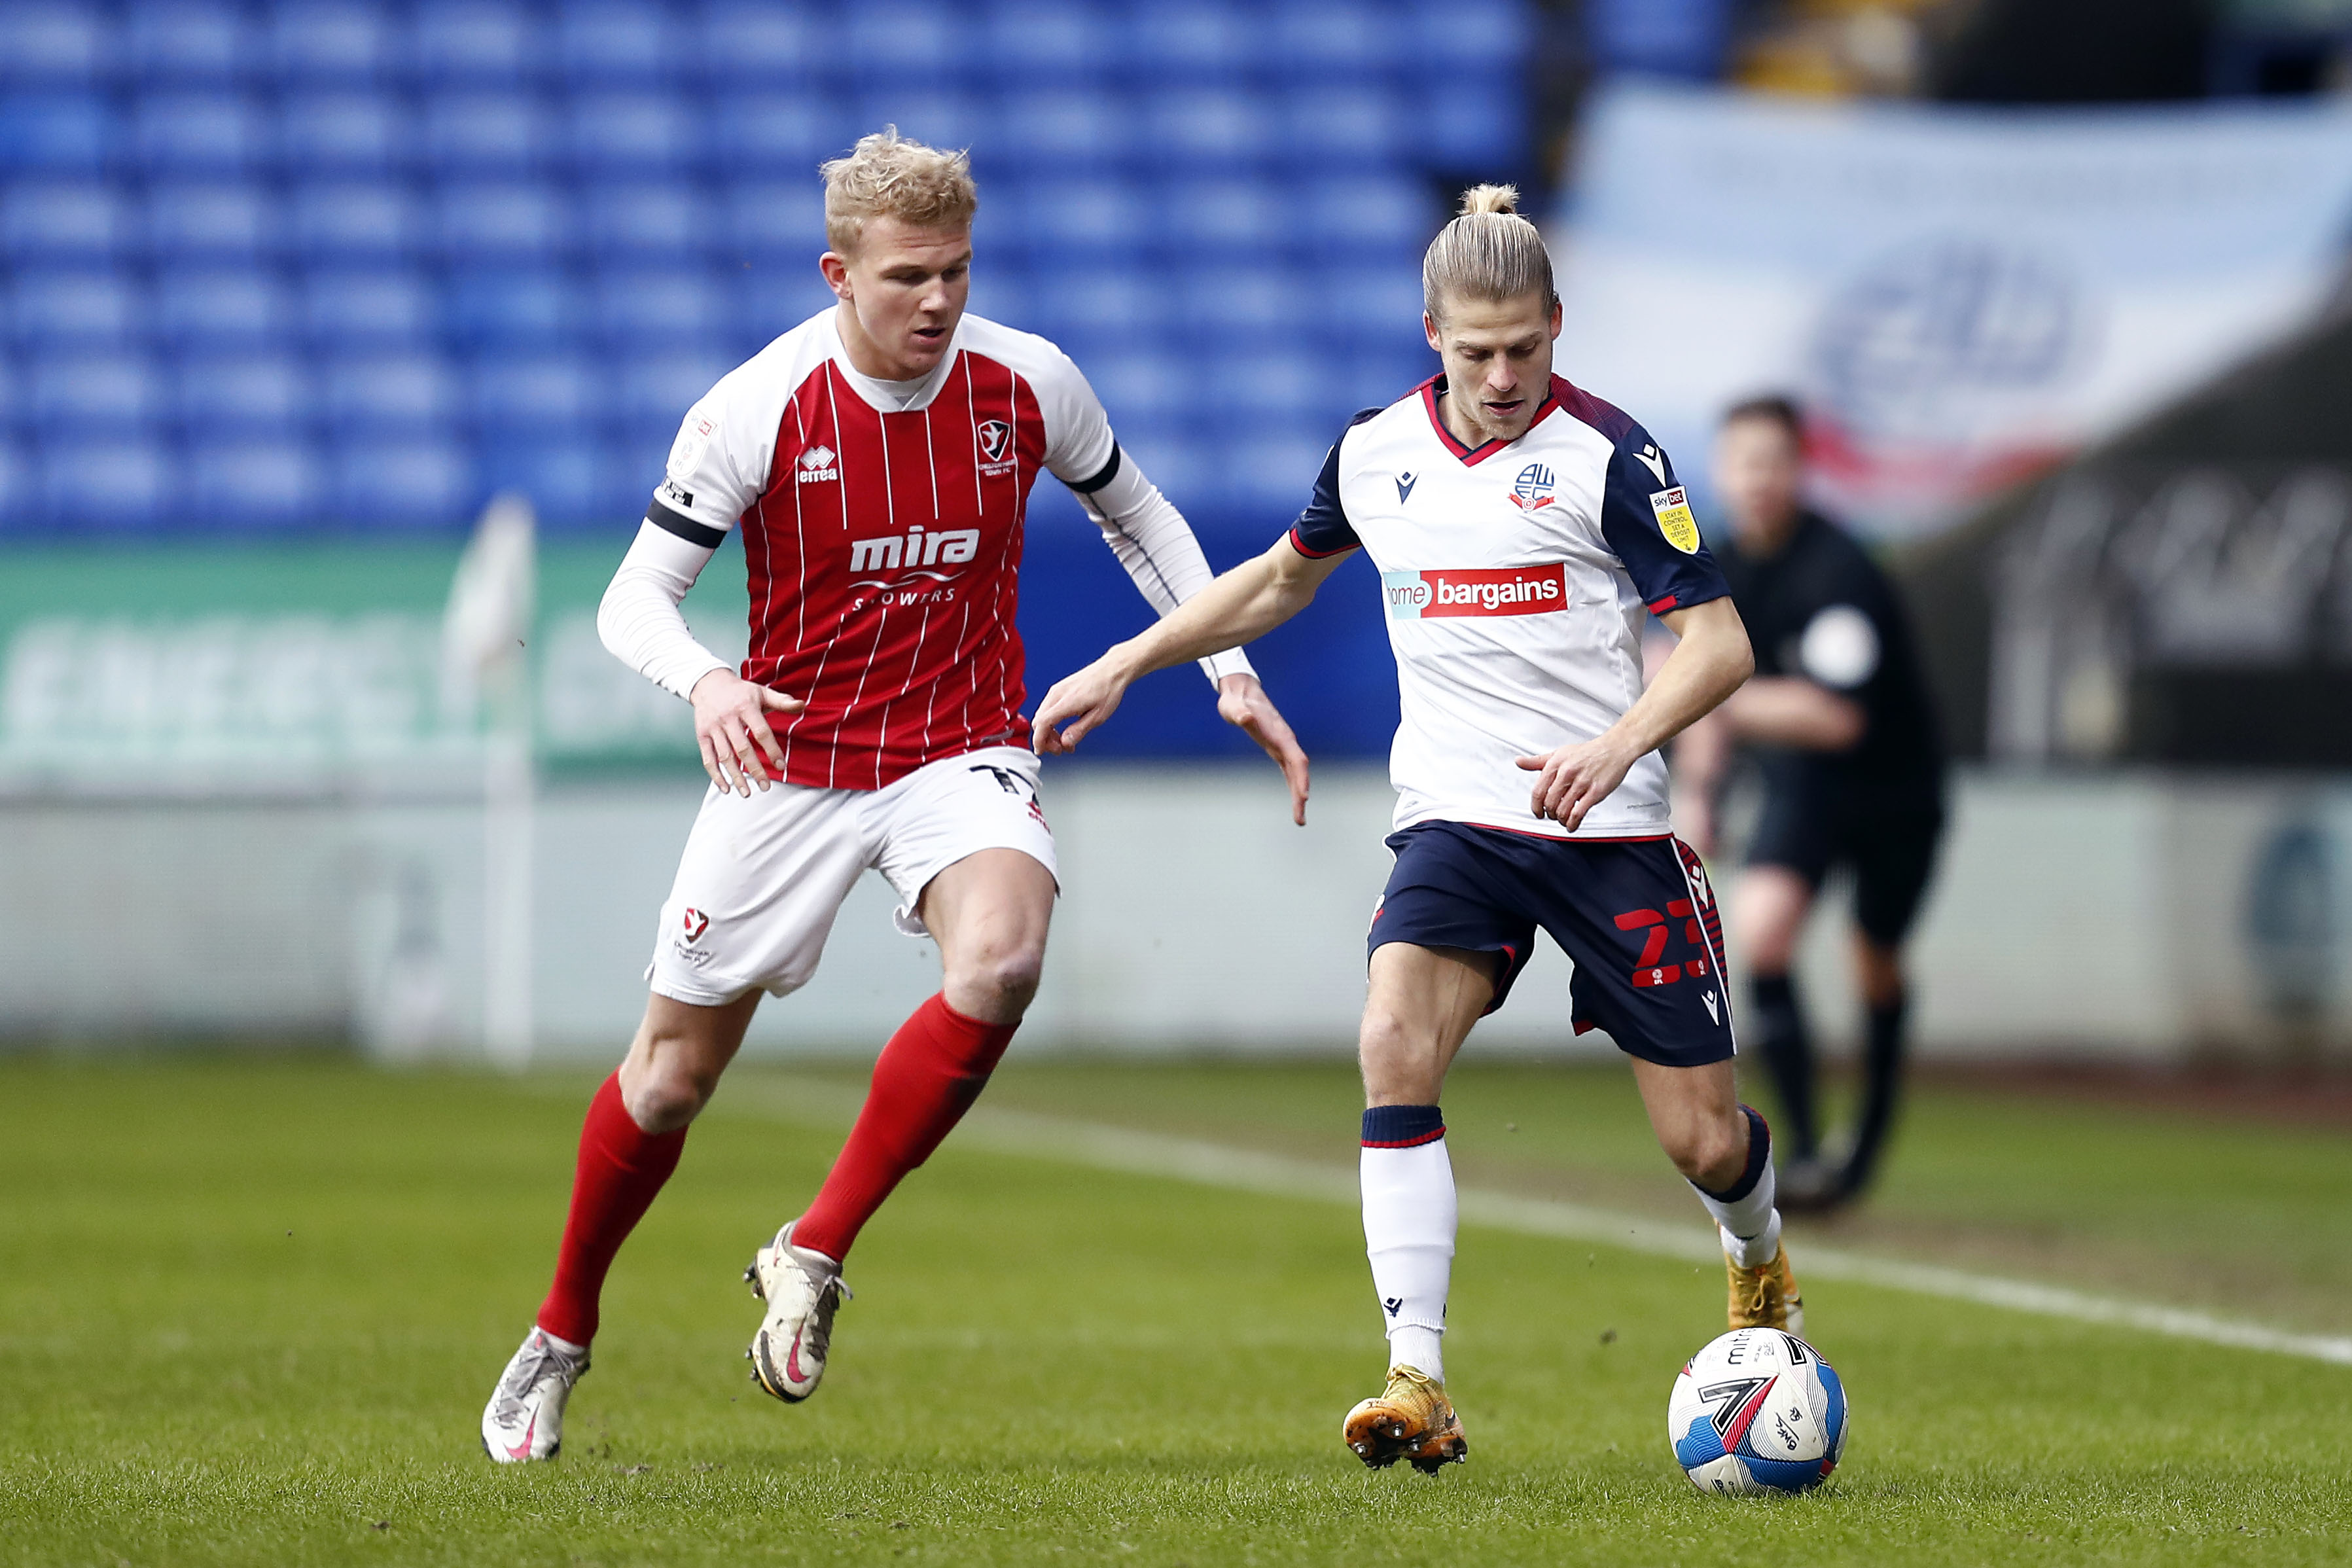 Bolton Wanderers v Cheltenham Town - Sky Bet League 2